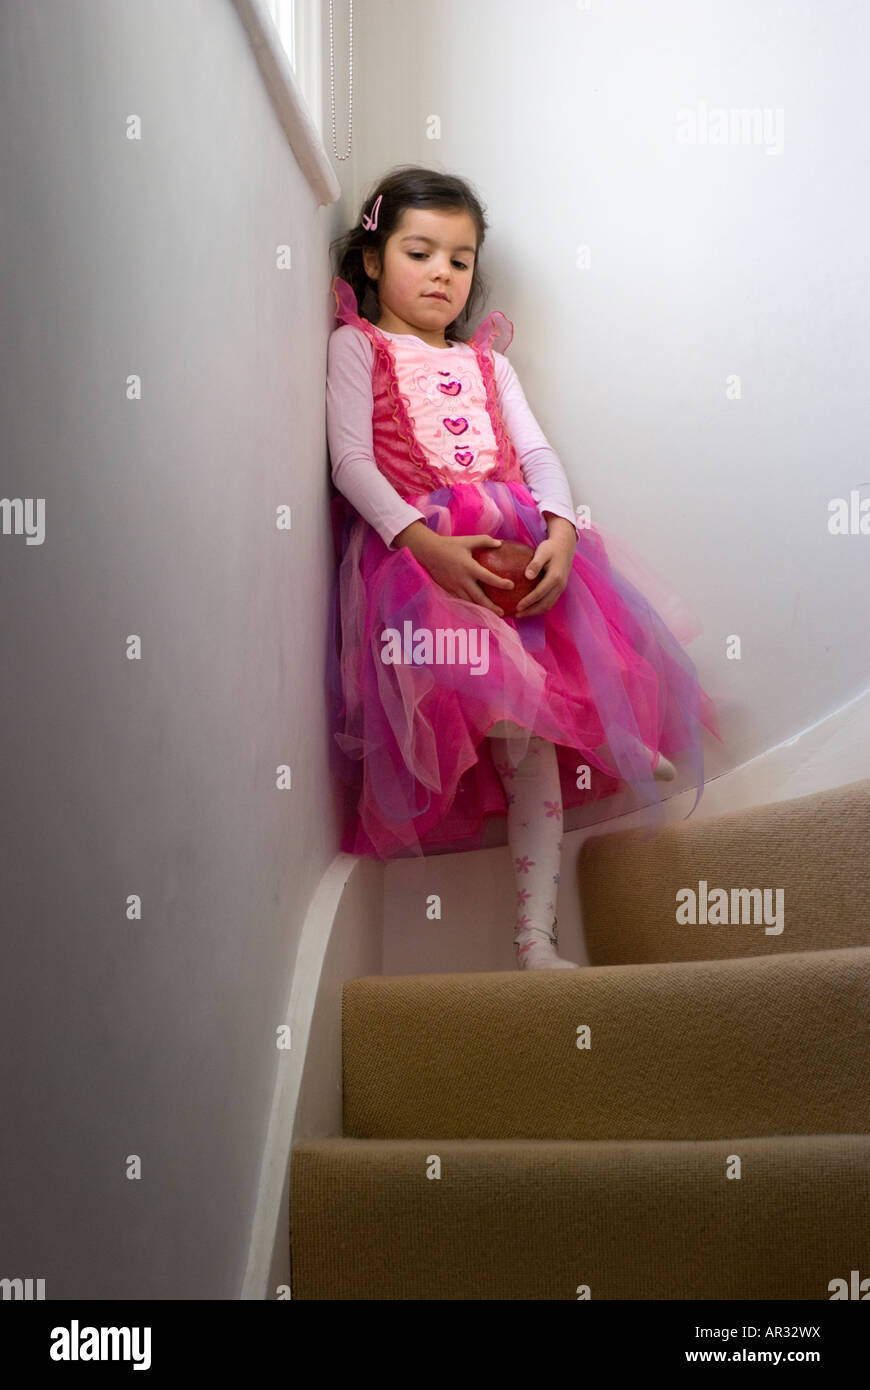 Launisch Kind auf Treppe Stockbild